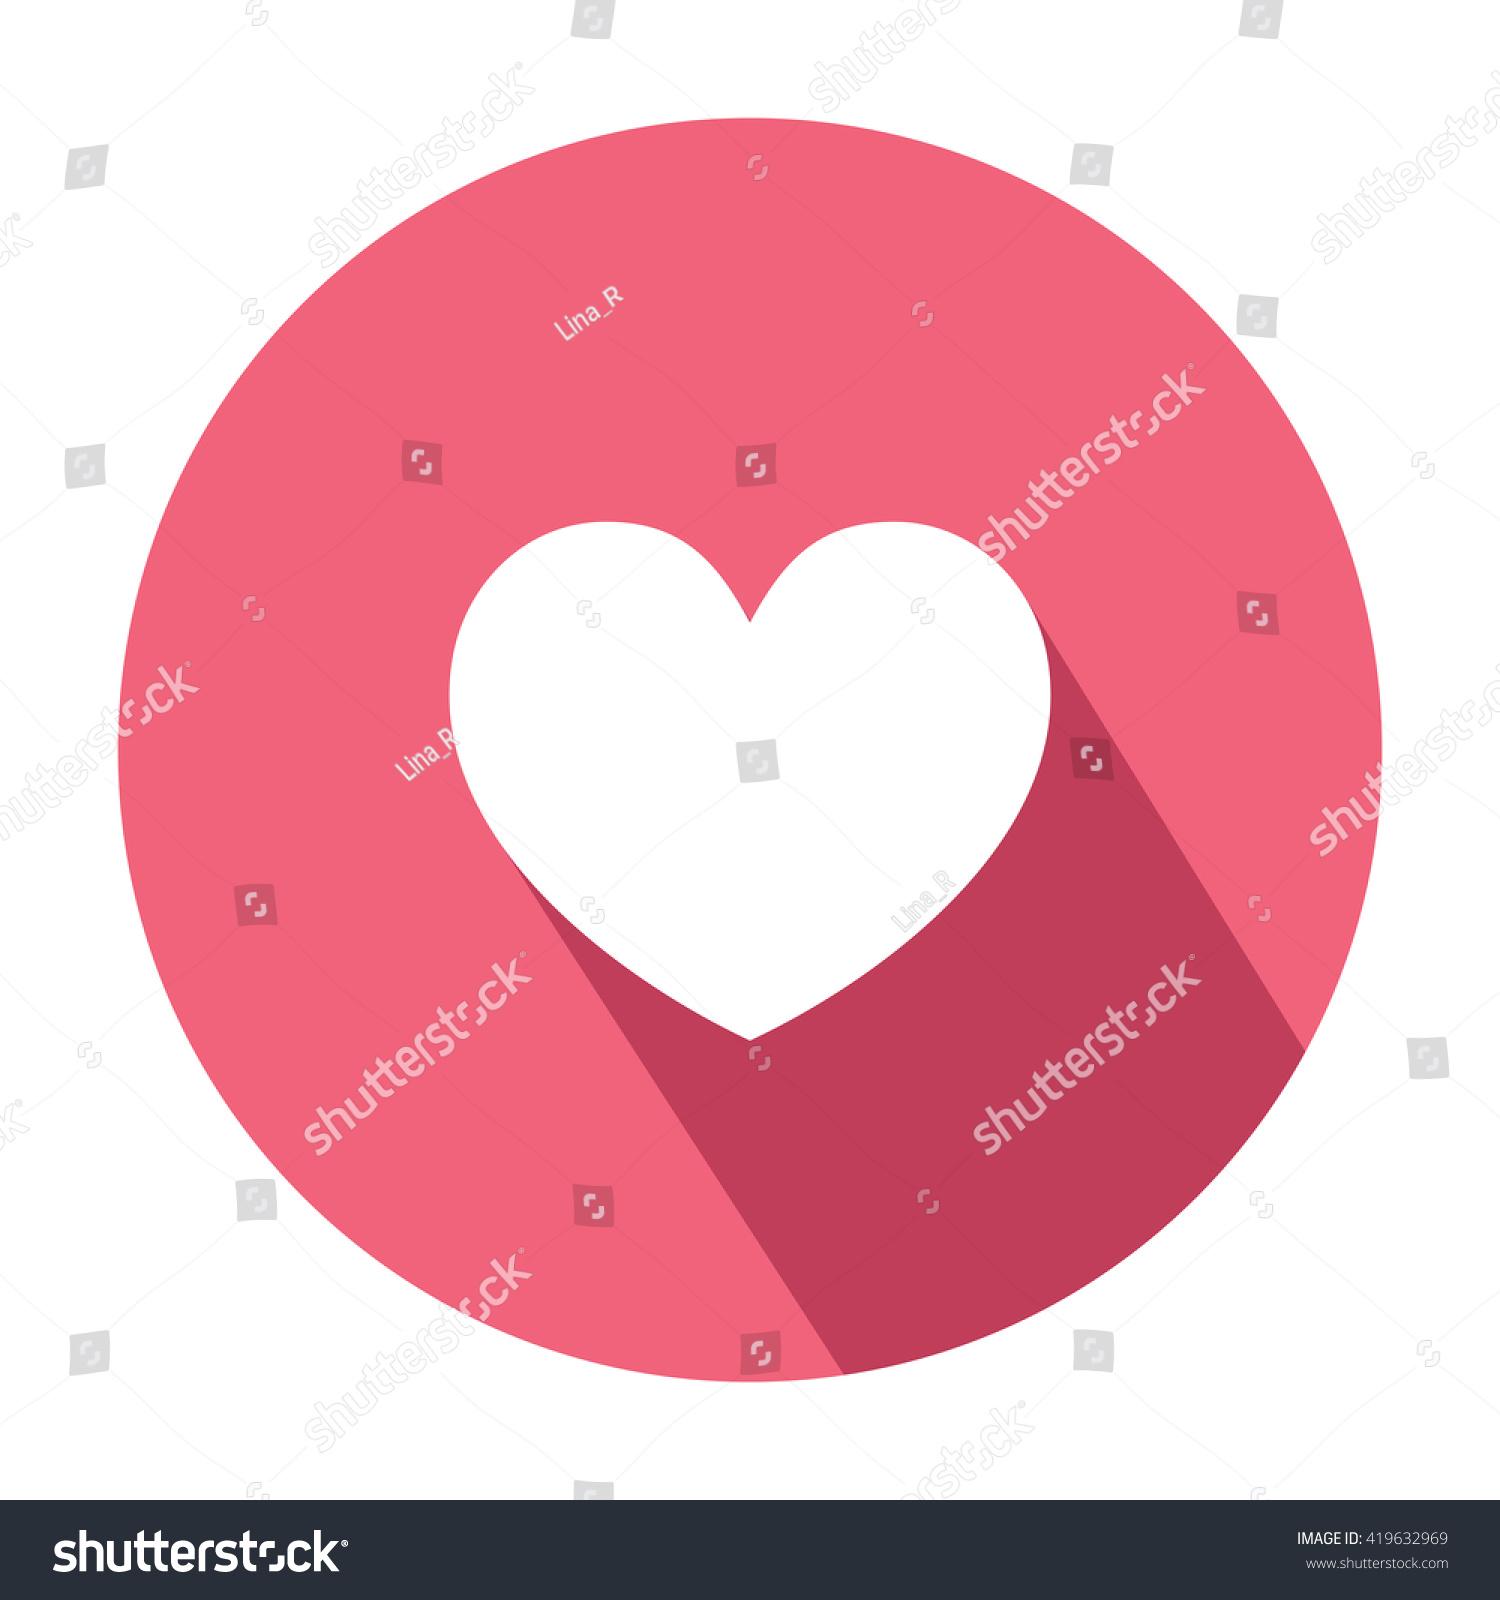 Love Hearts Emotions Wallpaper : love heart emoticon symbols Gallery